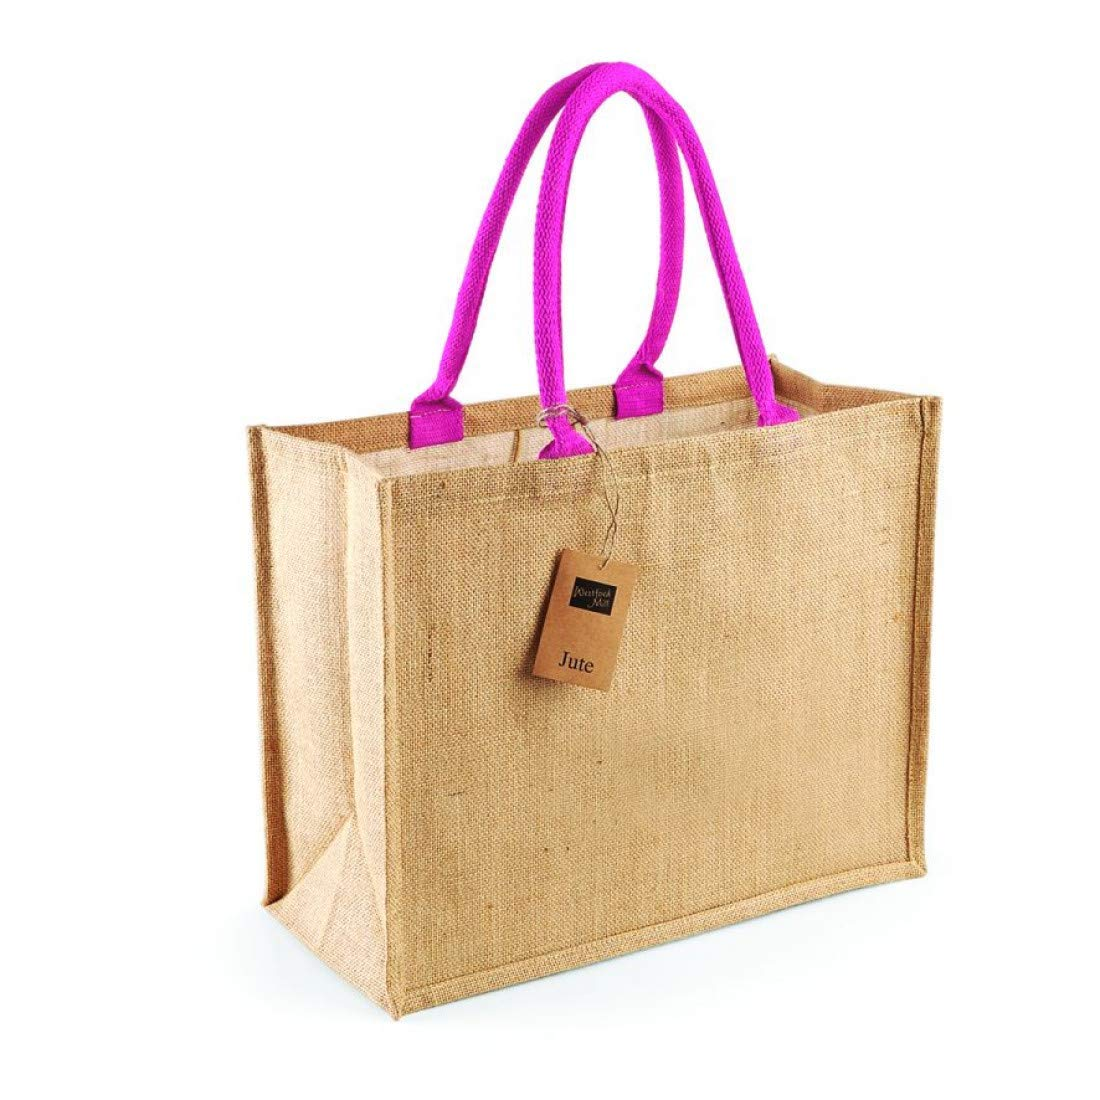 Westford Mill Classique Jute Shopper